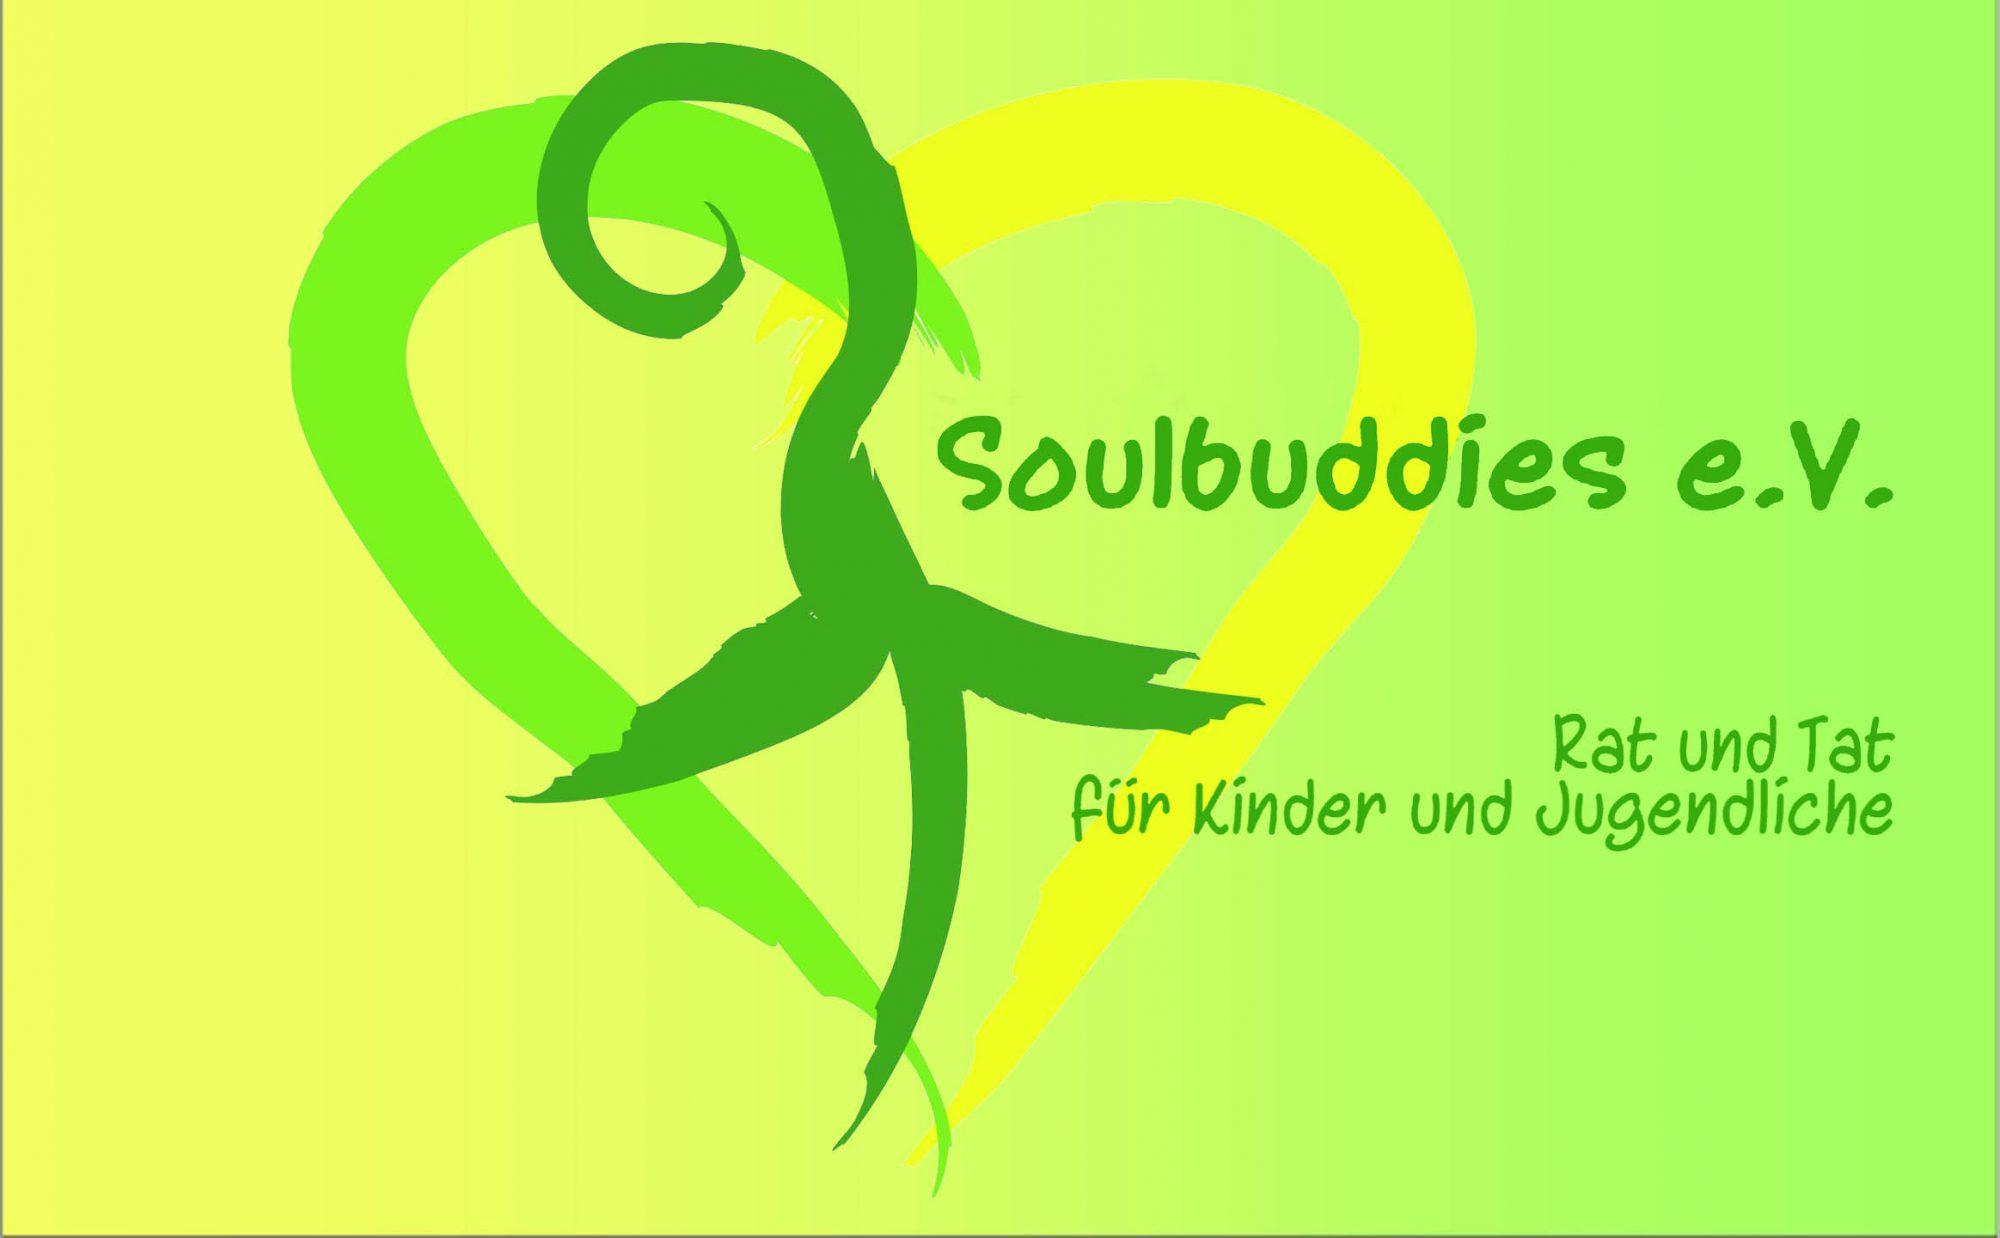 Soulbuddies e.V.